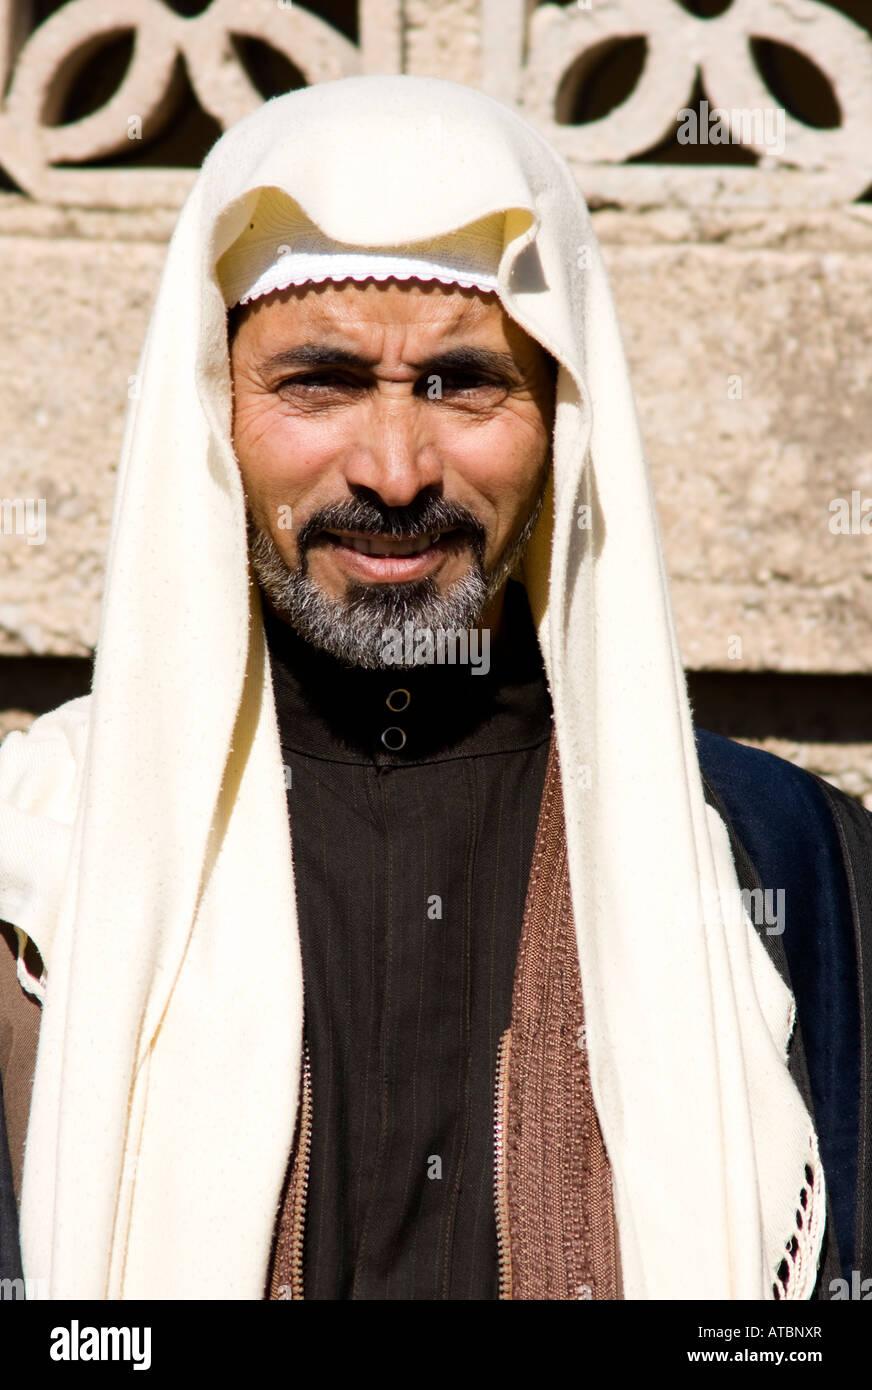 traditiona clothing, Philippopolis, Syria - Stock Image